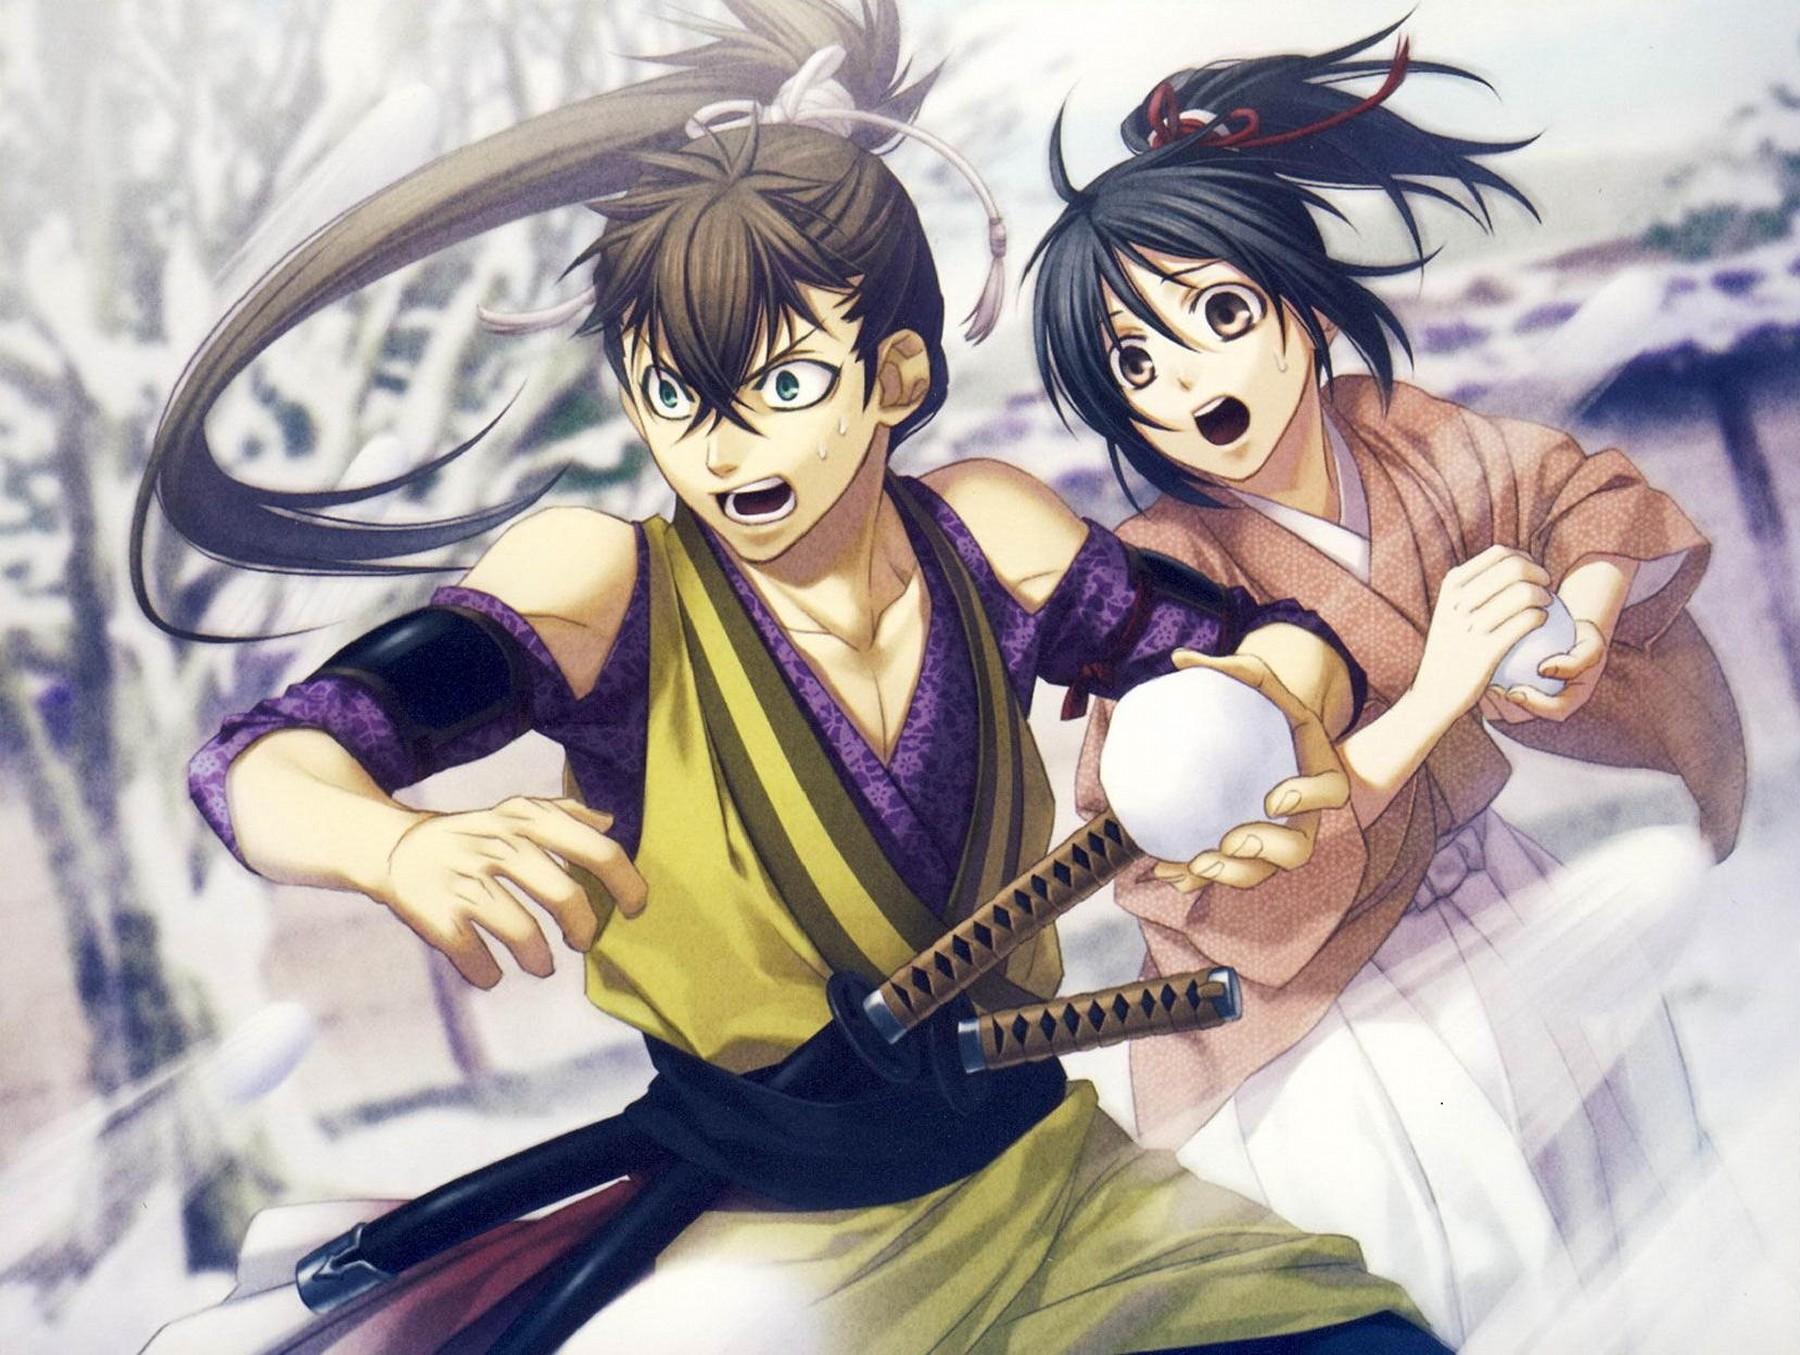 toudou heisuke hakuouki cg art zerochan anime image board